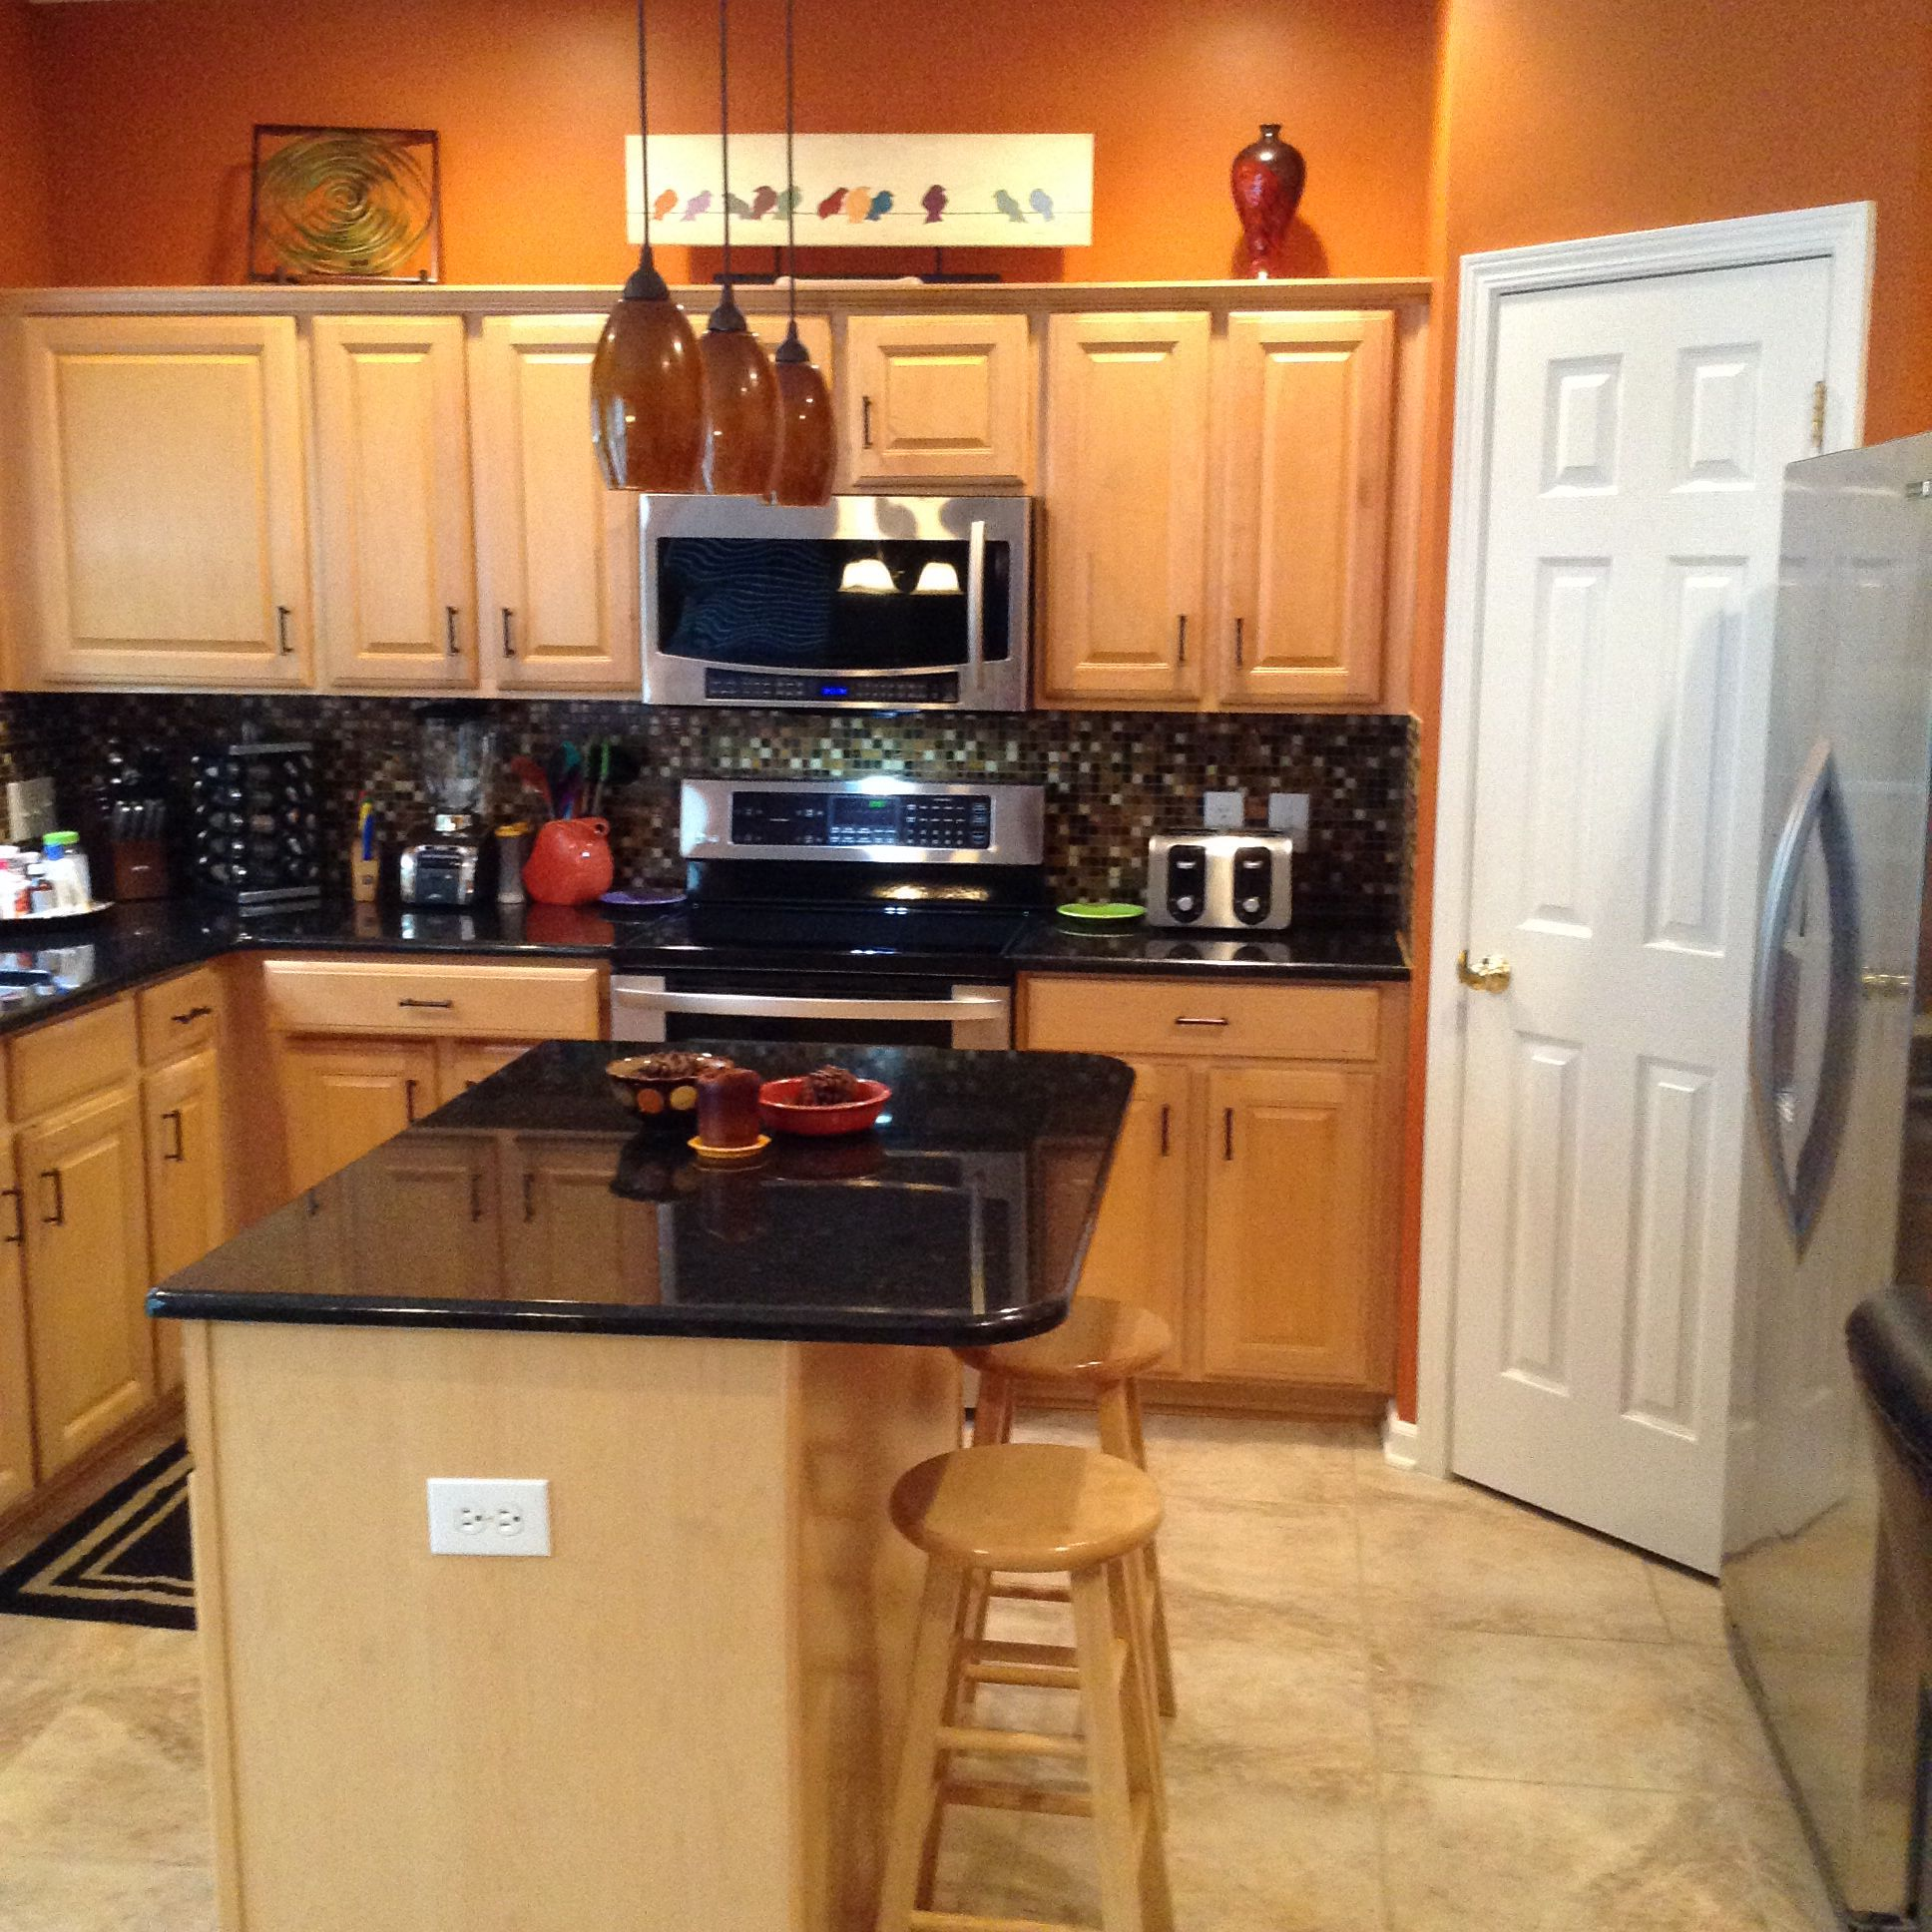 Burnt Orange Kitchen With New Tile Flooring Orange Kitchen Walls Orange Kitchen Decor Kitchen Decor